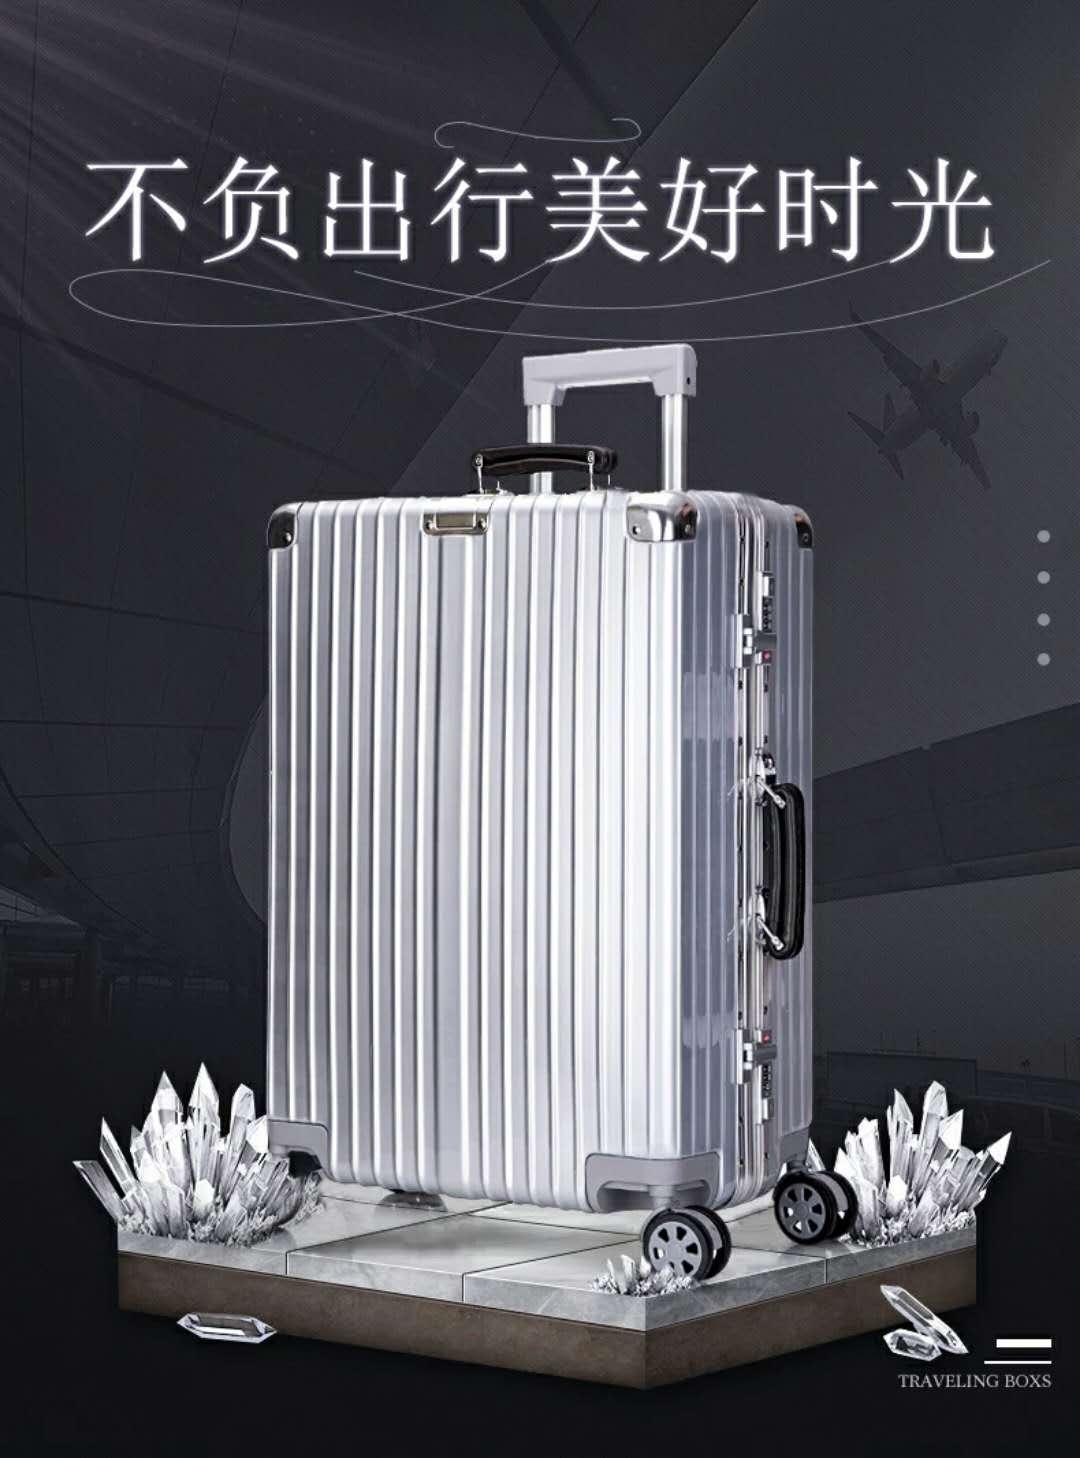 smooire行李箱怎么样、质量如何